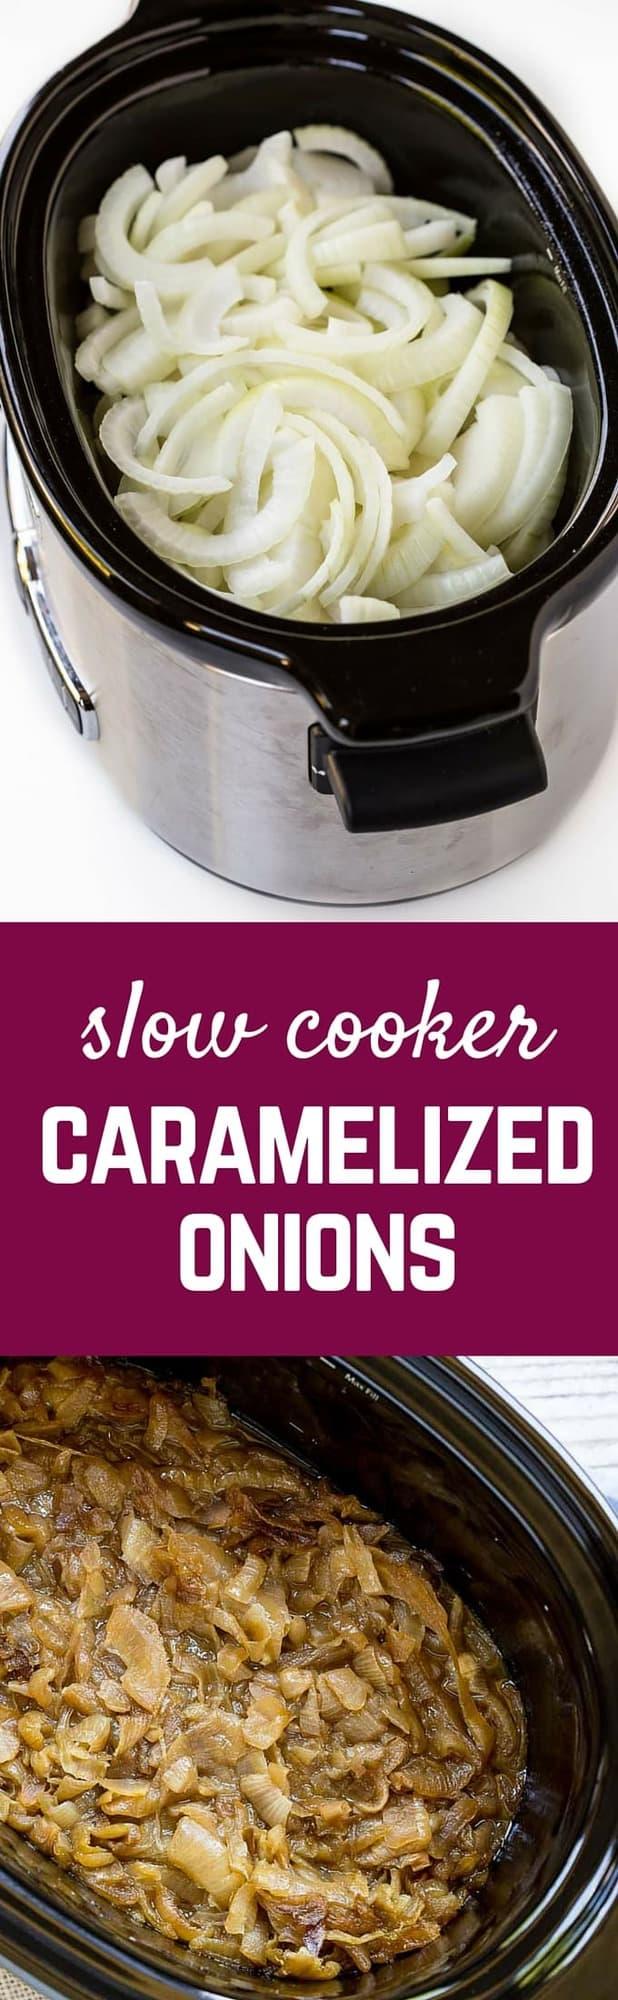 Slow Cooker Caramelized Onions - Rachel Cooks®